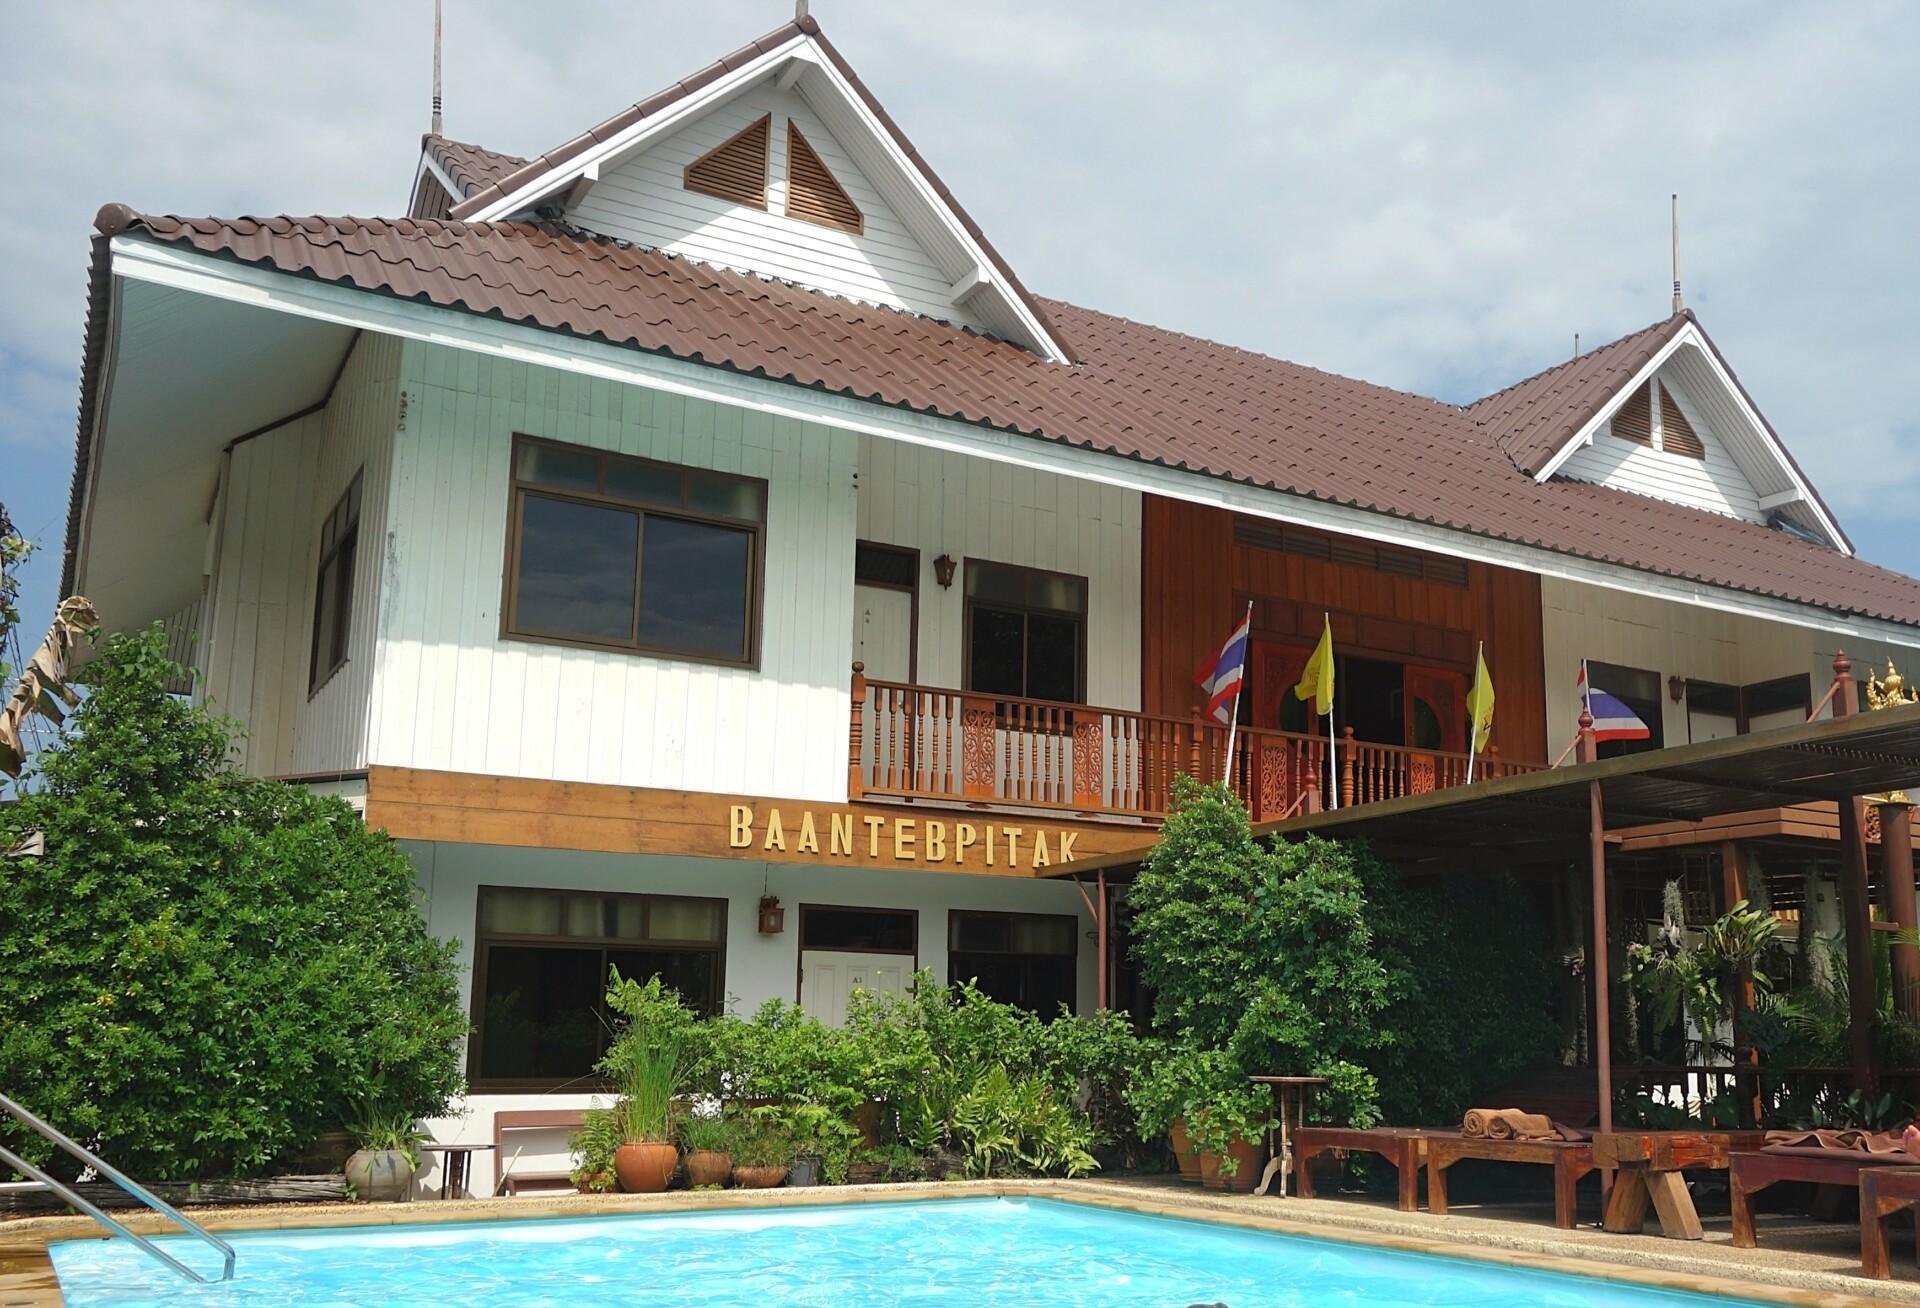 Hotelanmeldelse i Thailand: Guesthouse Baan Tebpitak med pool i Ayutthaya